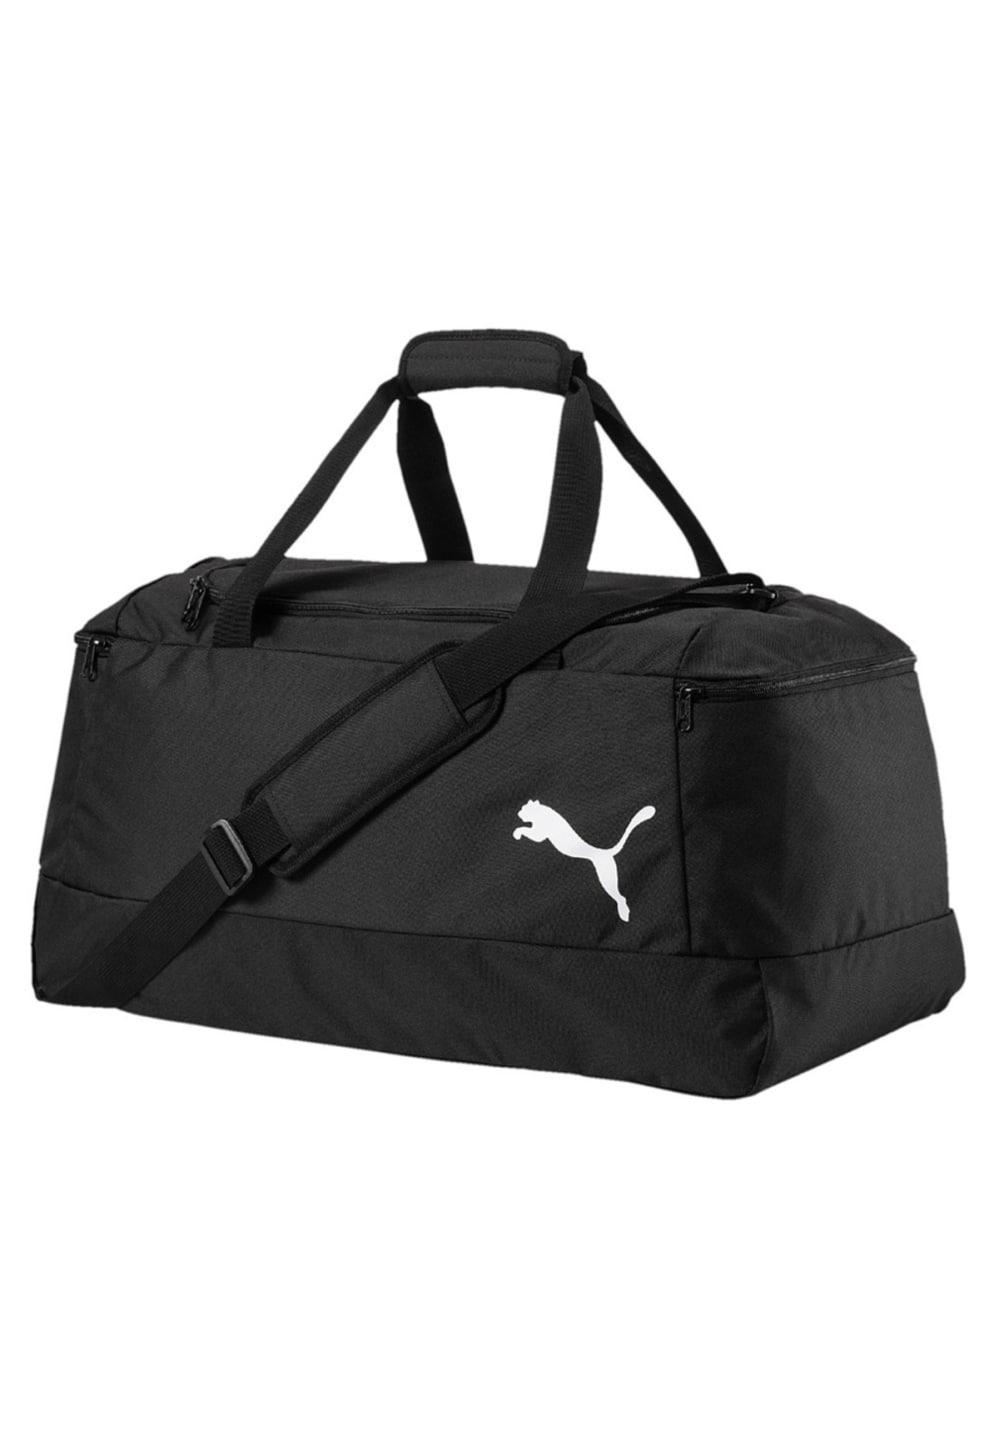 Puma Pro Training II Medium Bag Sporttaschen - Schwarz